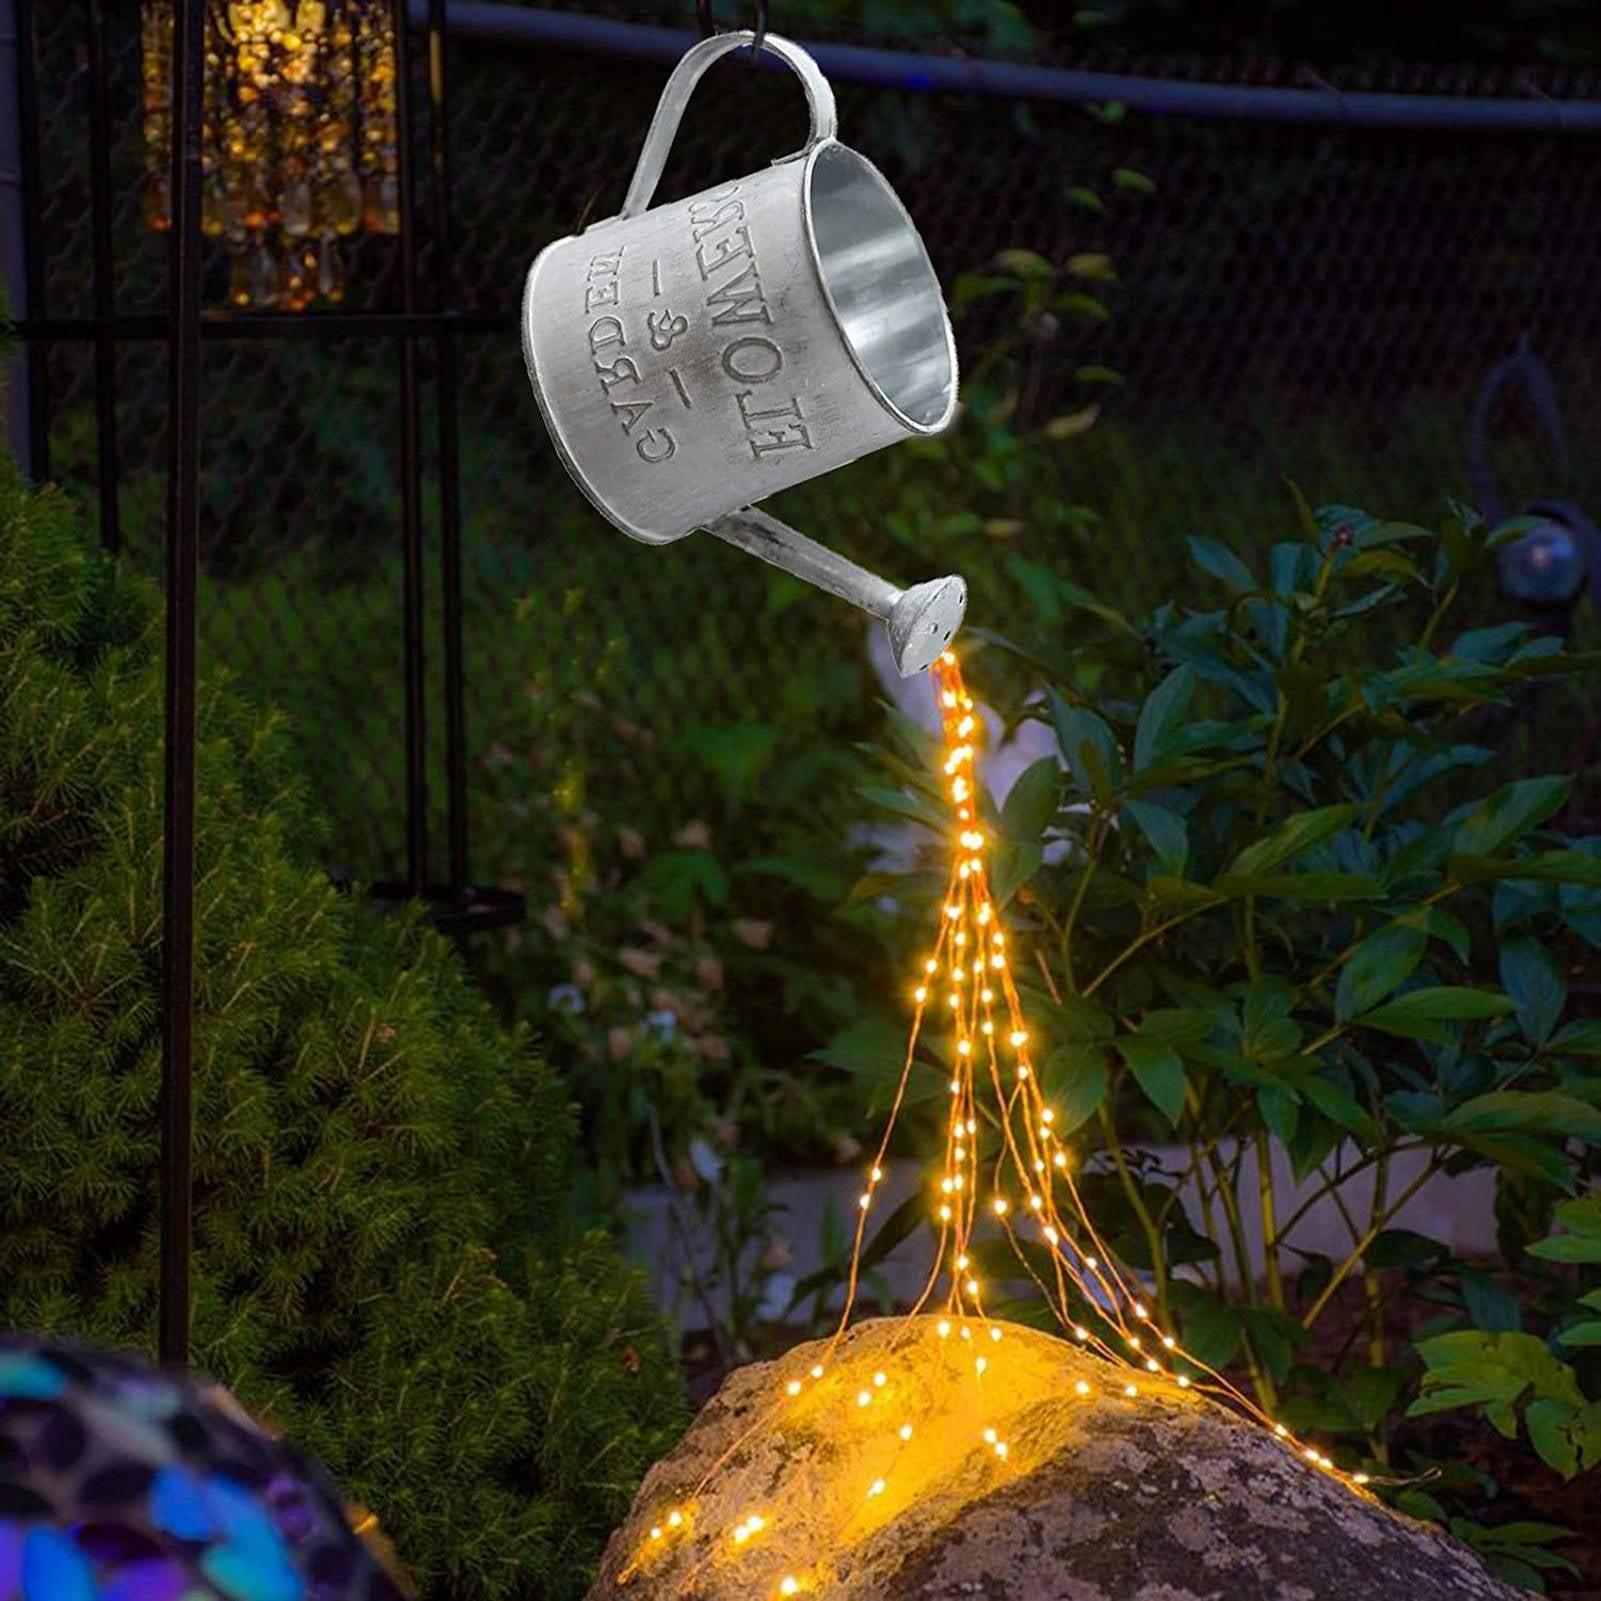 Cyan oak Star Shower Garden Art Light Waterproof LED Watering Can String  Lights Hanging Lights Battery Powered for Walkway Patio Lawn Yard